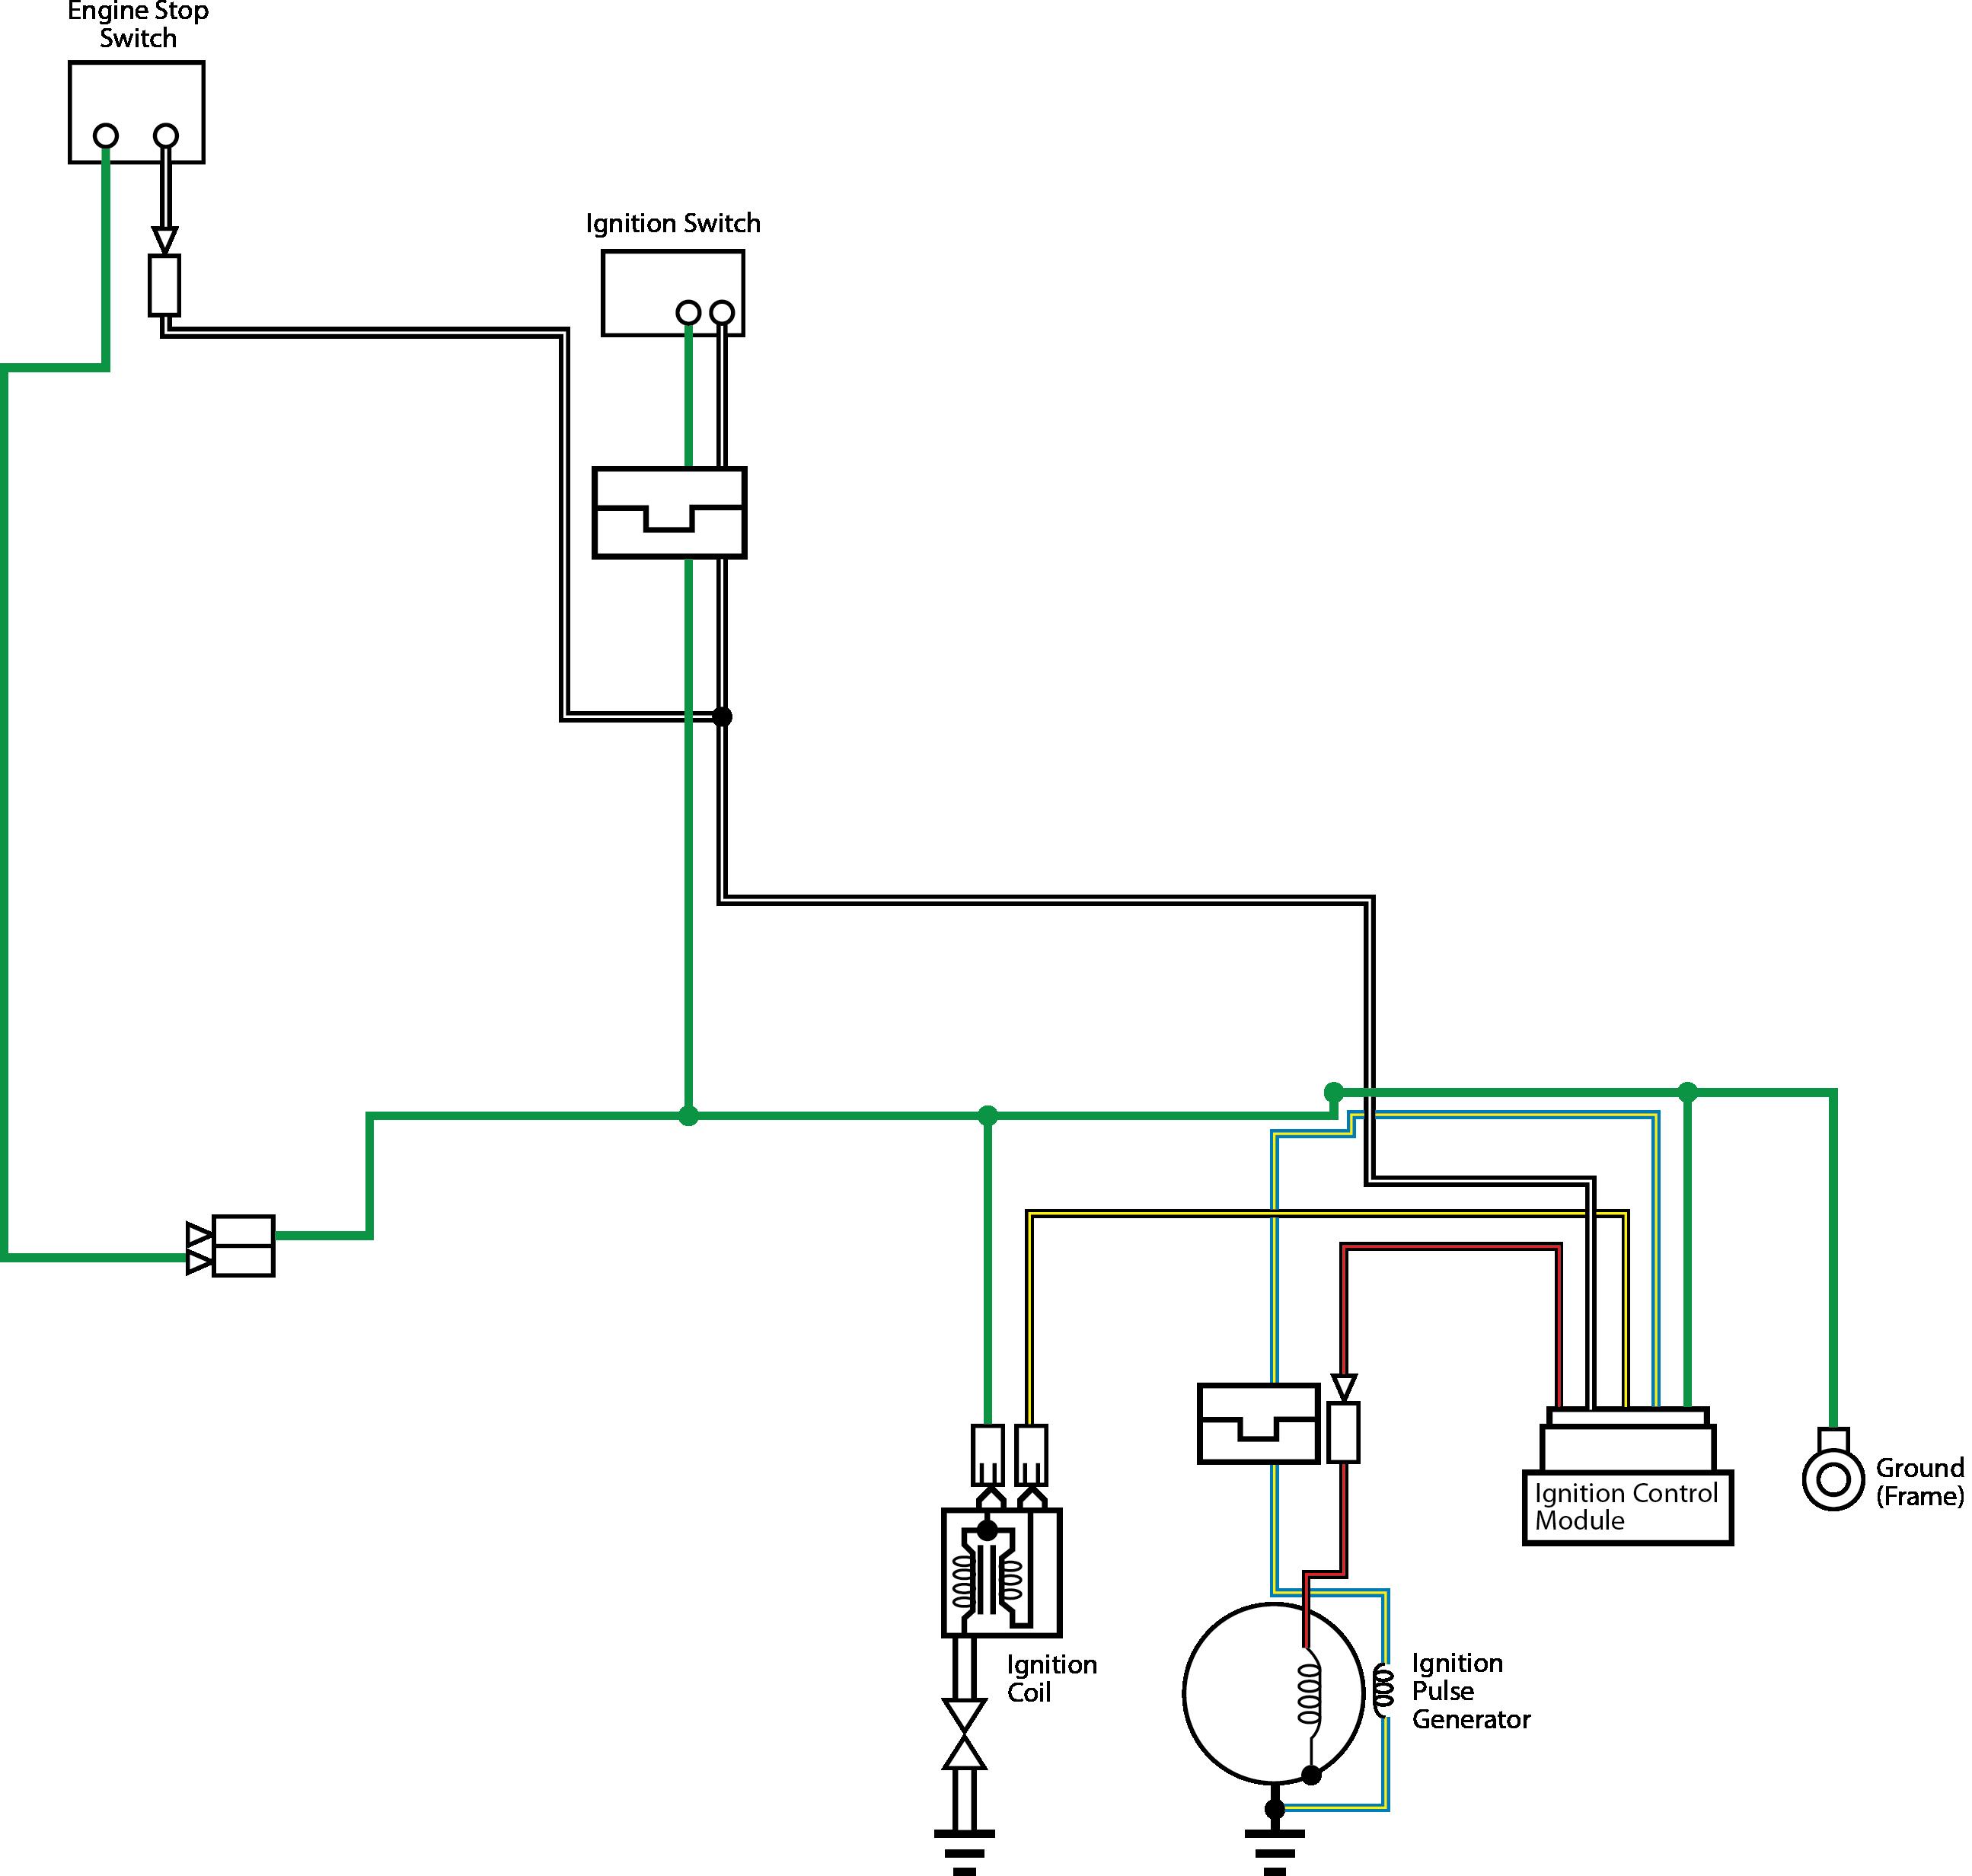 klx wiring diagram klx 110 wiring diagram klx wiring diagrams honda 50cc dirt bike wire diagram honda auto wiring